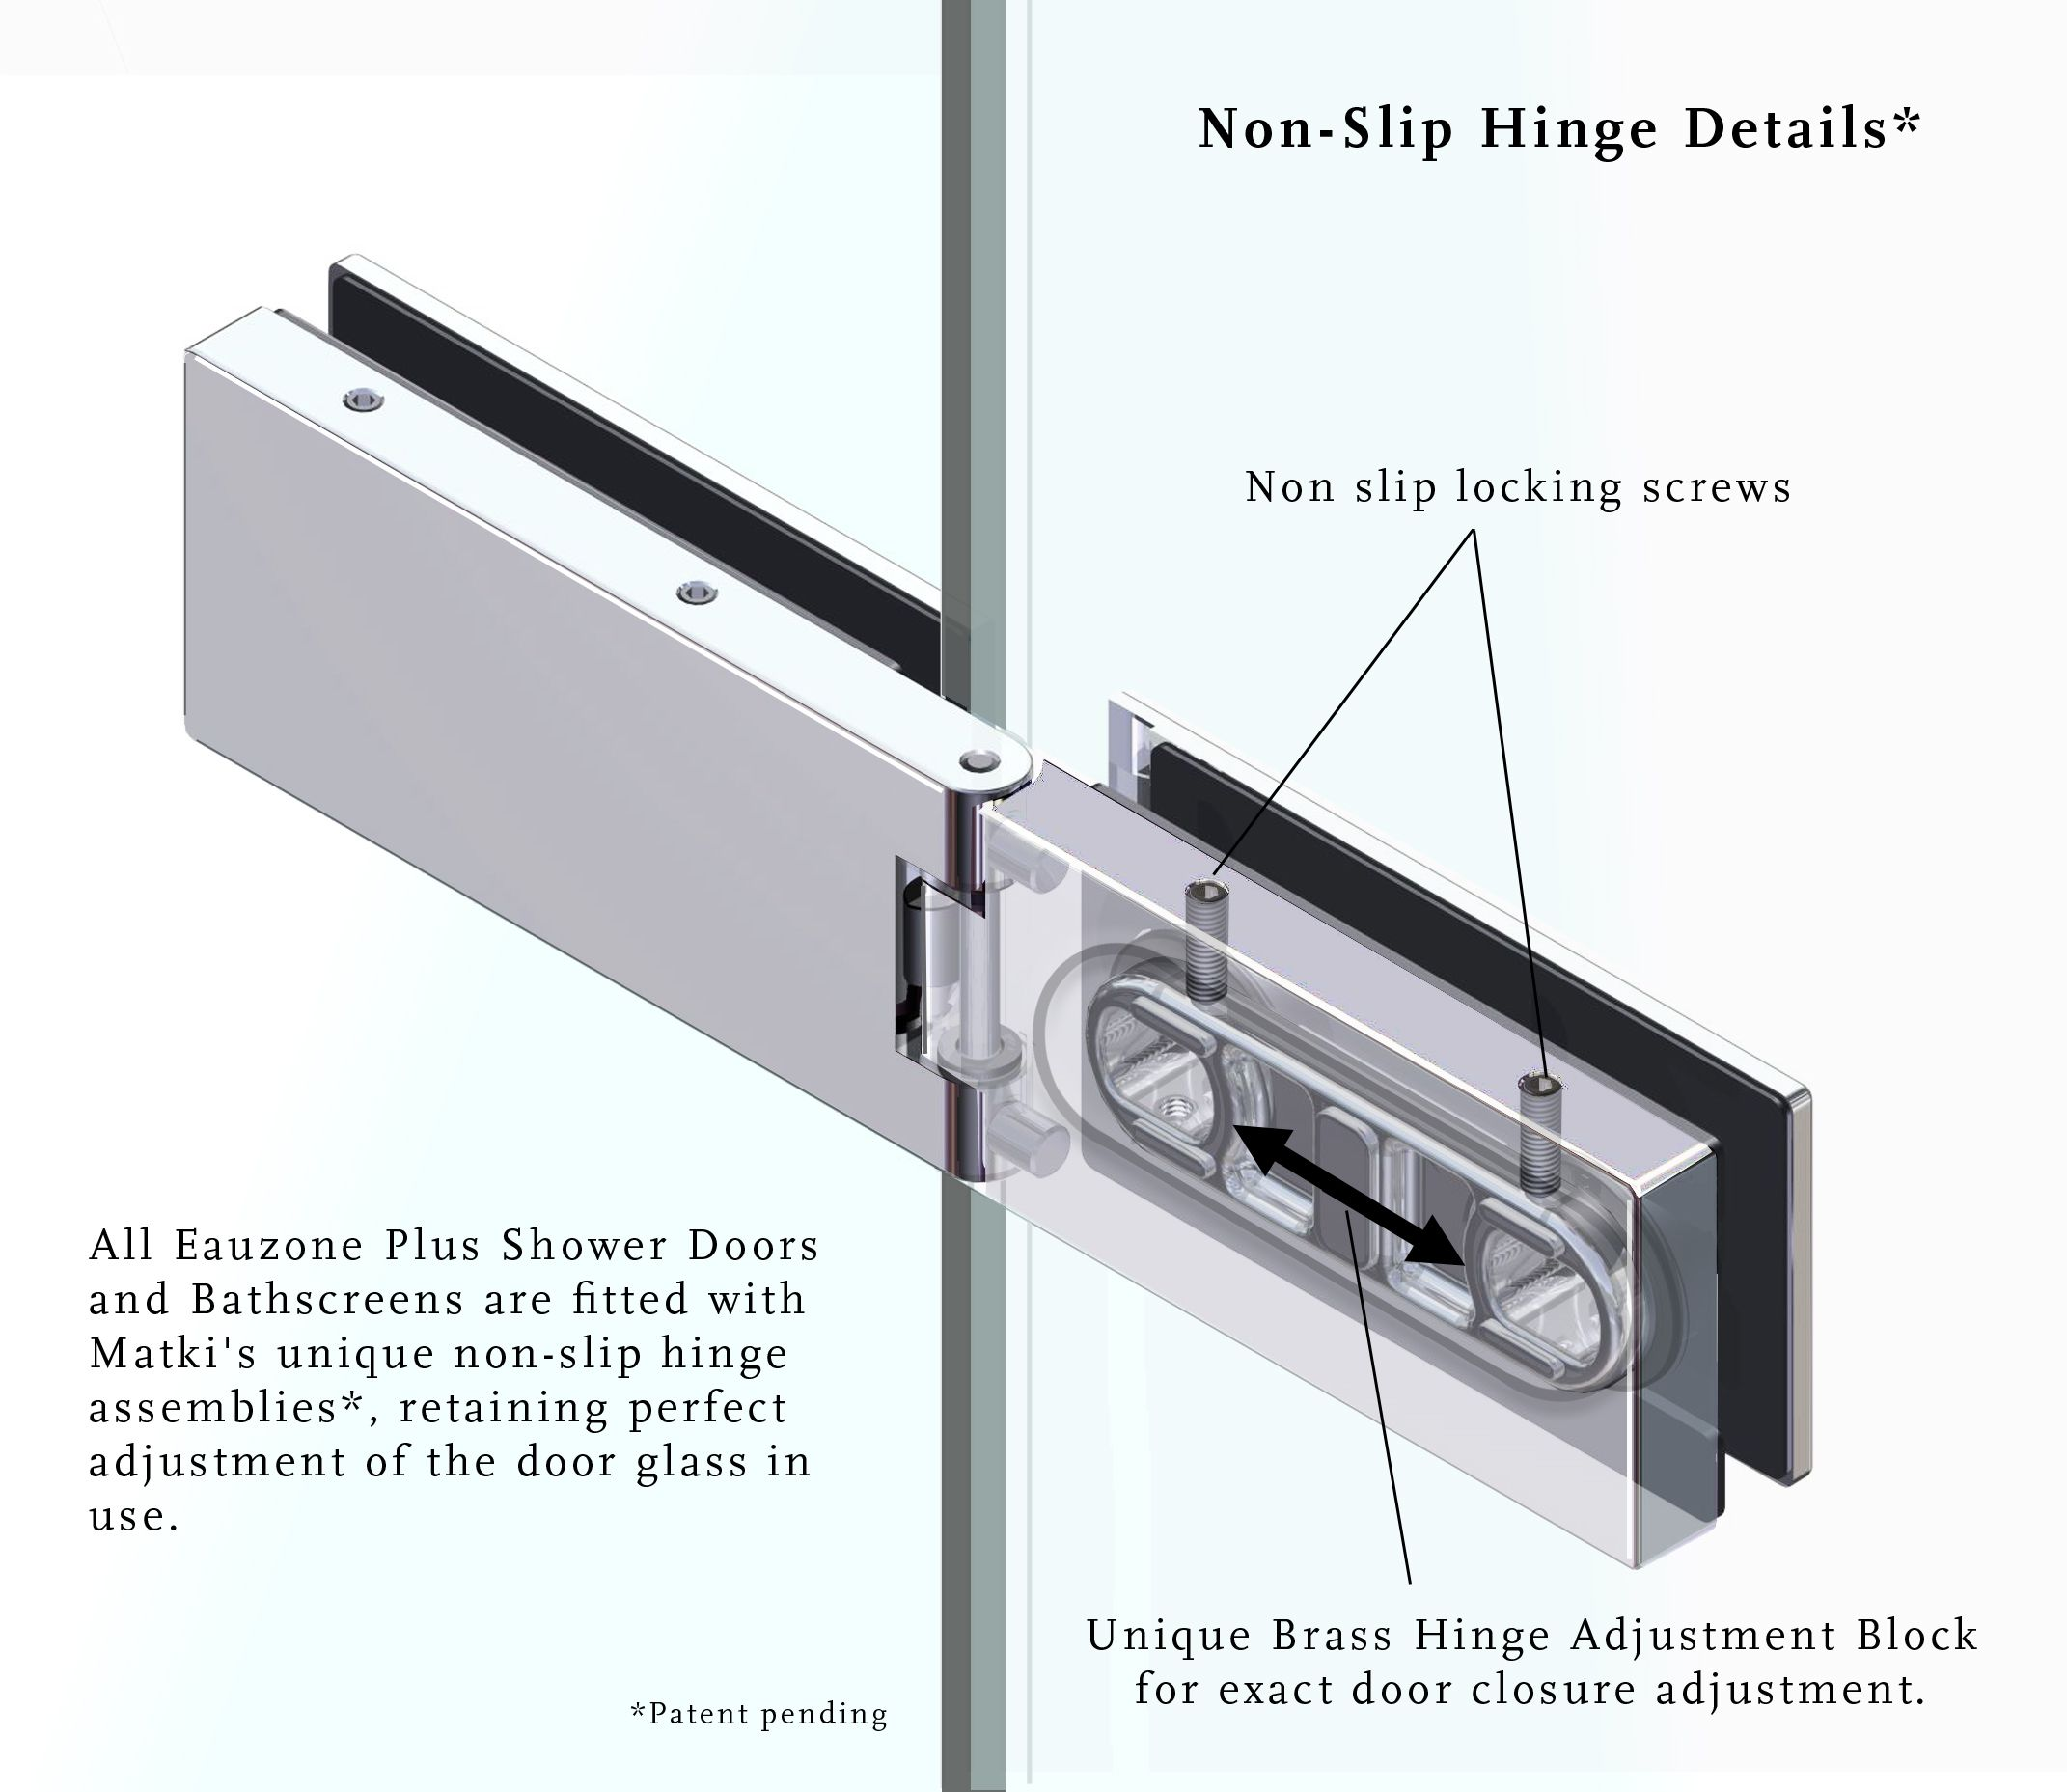 Eauzone Plus Patented Hinge Detail Shower Doors Bath Screens